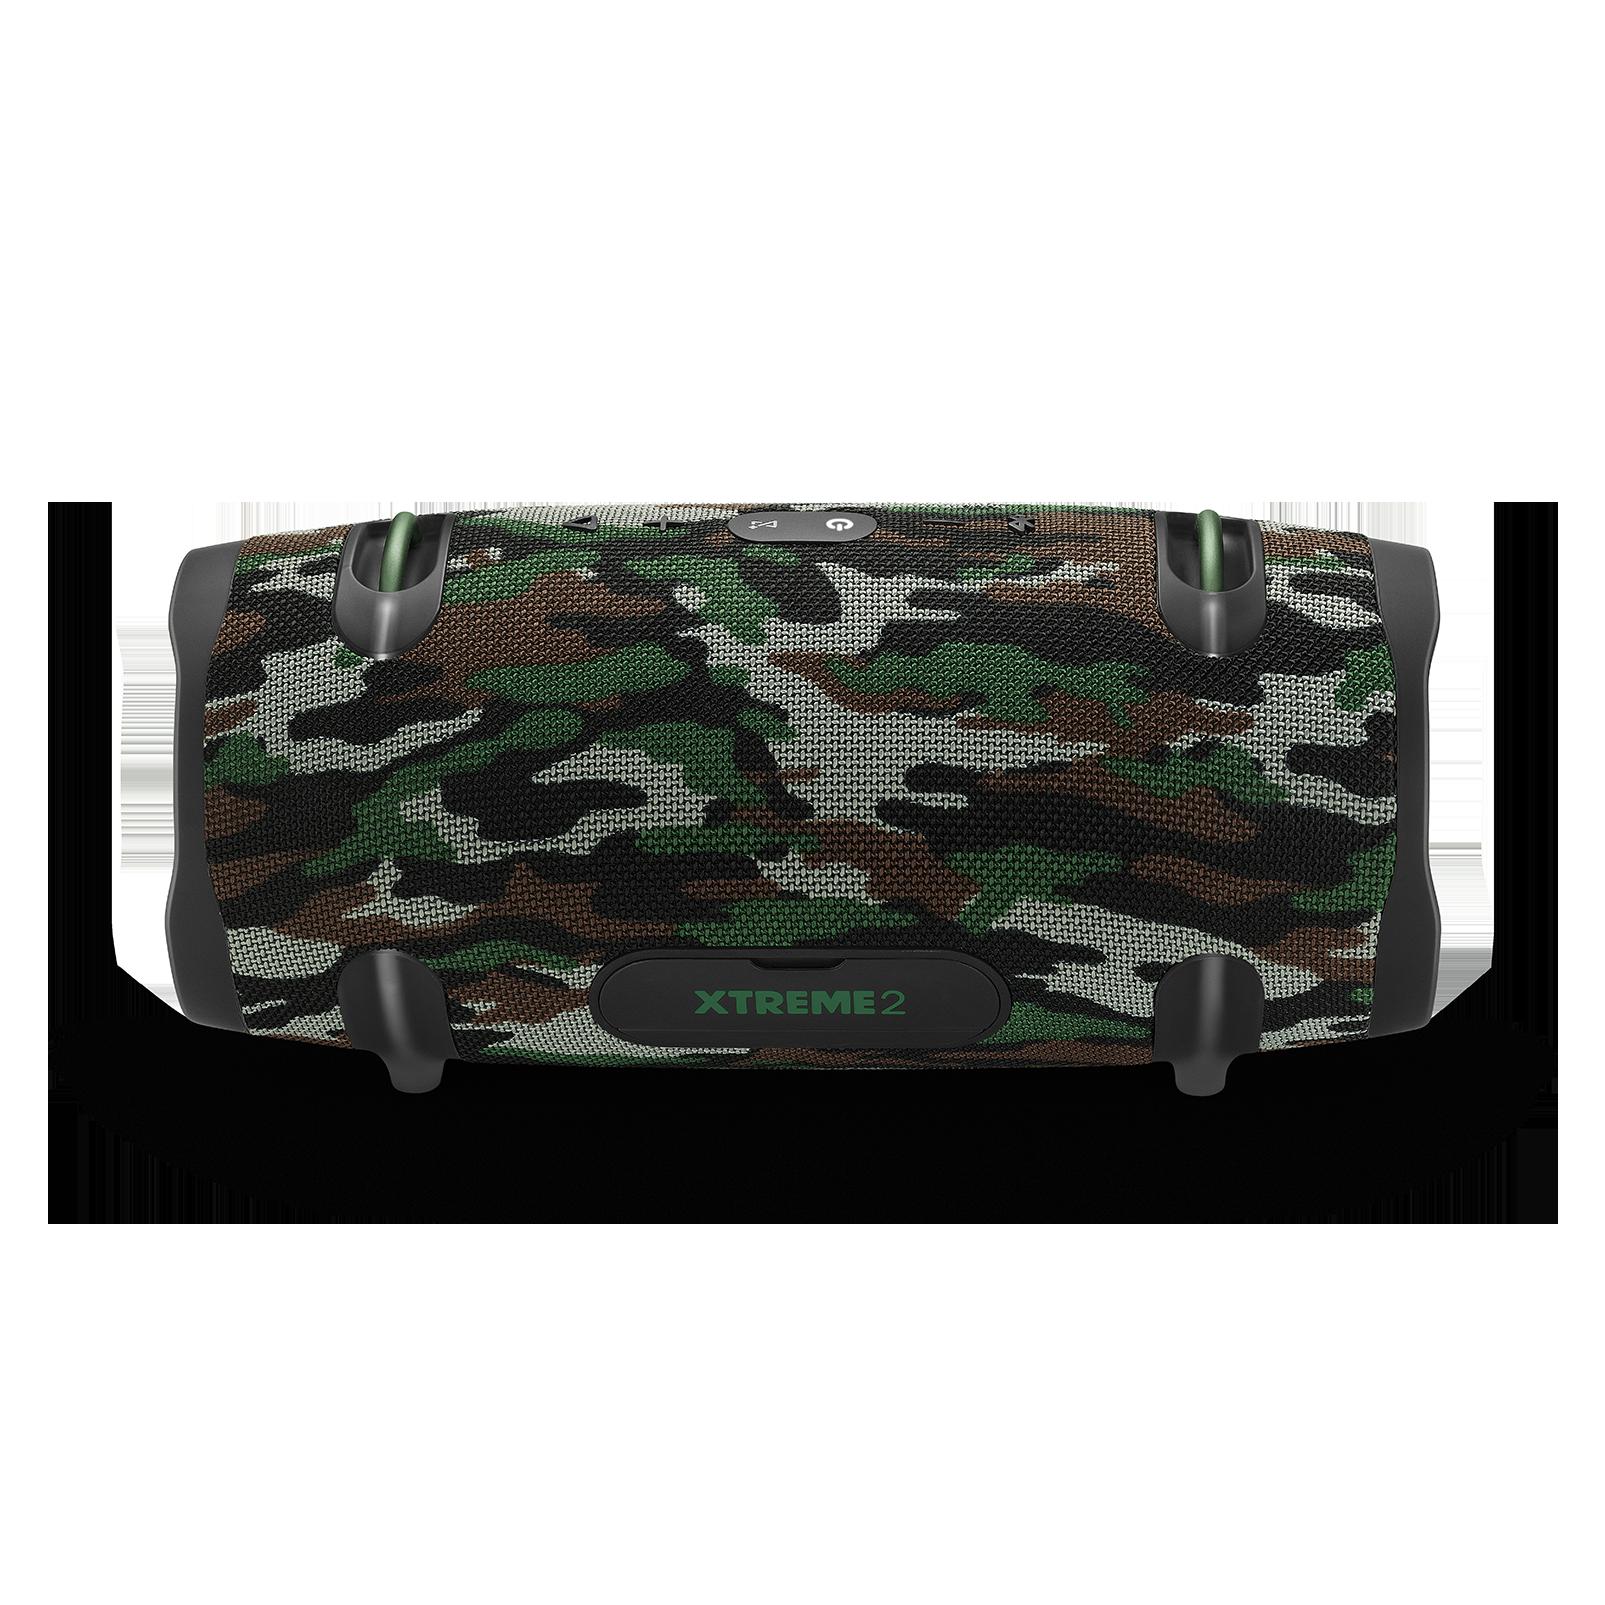 JBL Xtreme 2 - Squad - Portable Bluetooth Speaker - Back